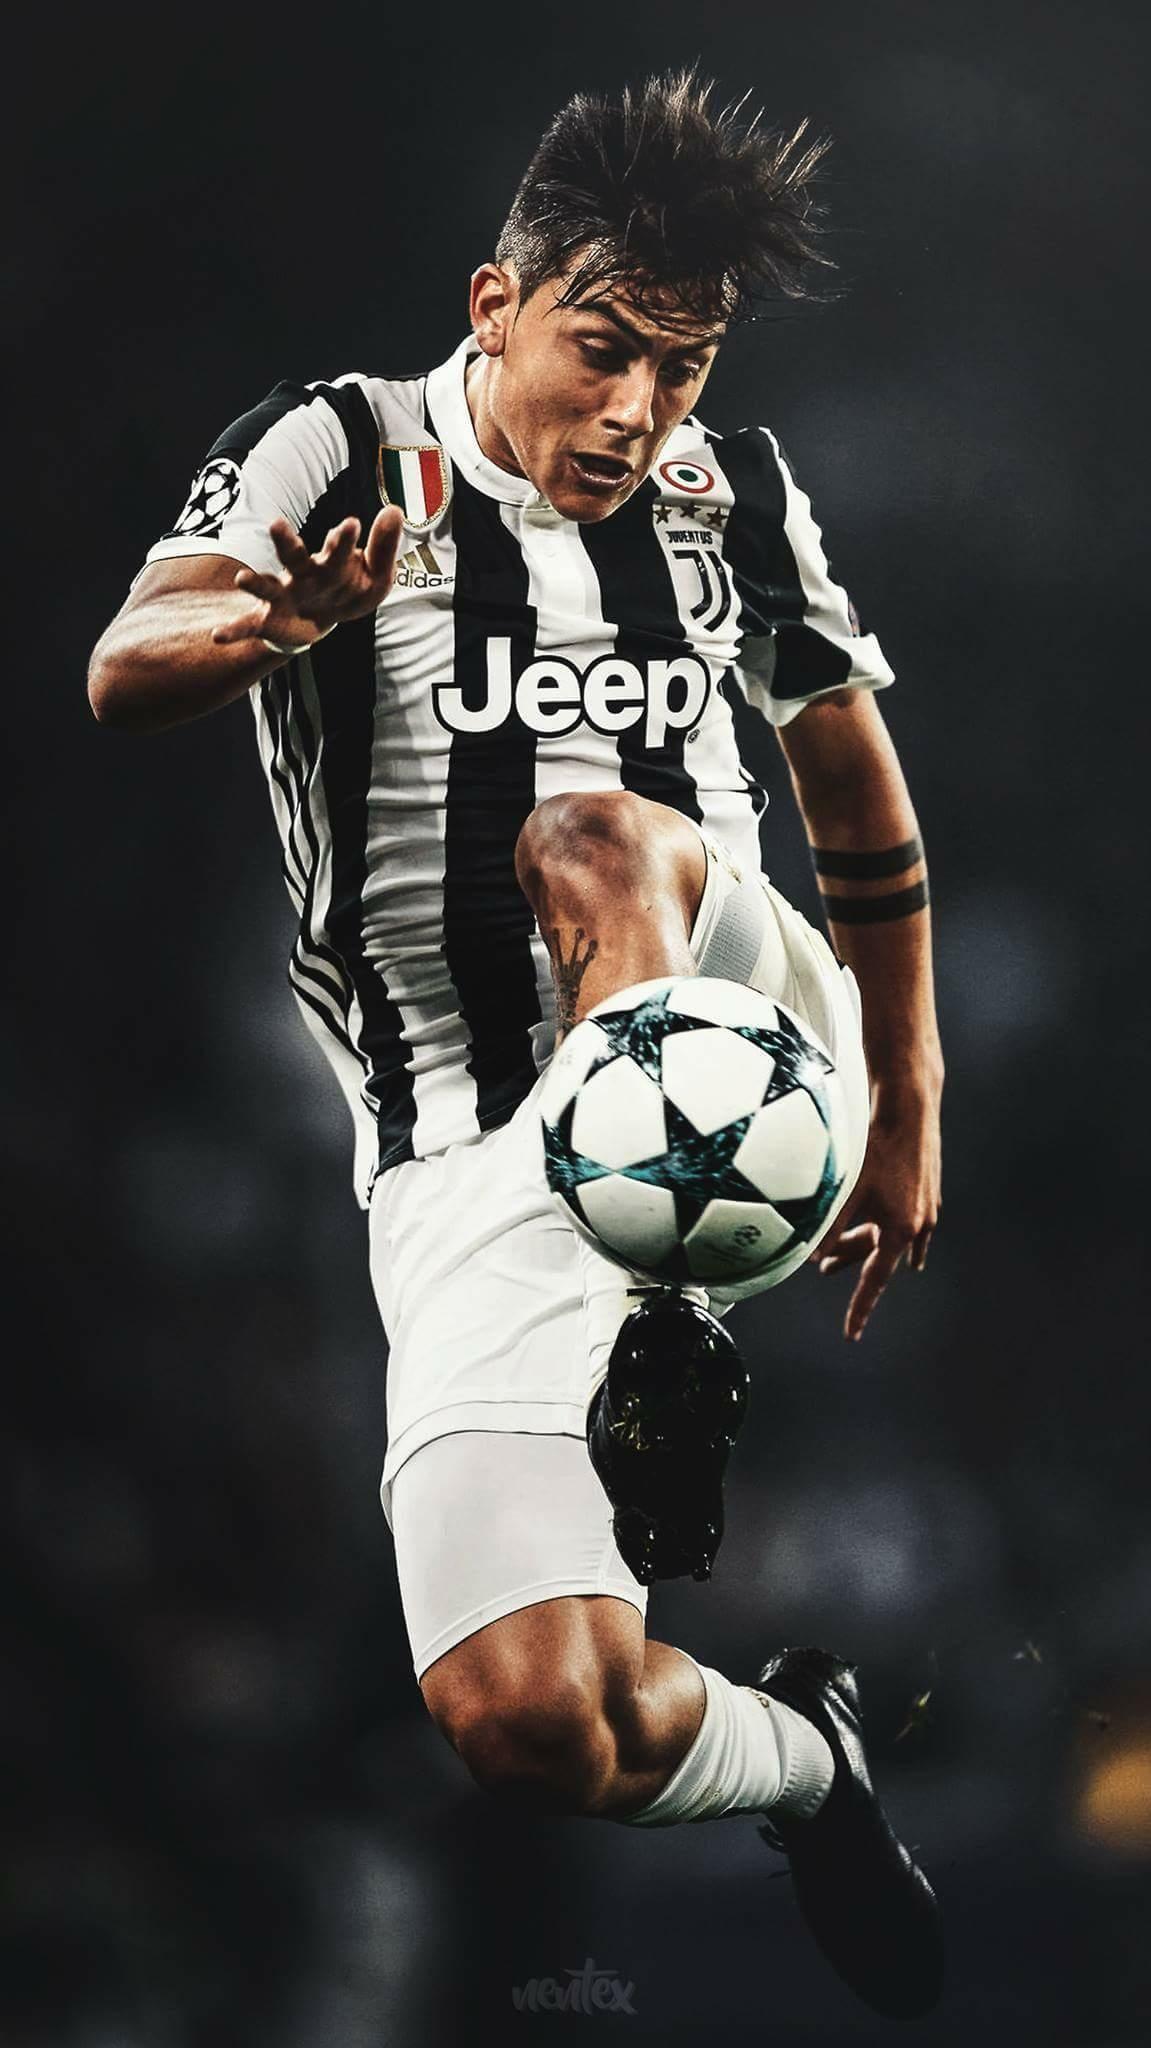 football wallpaper Juventus, Sports anime, Ronaldo